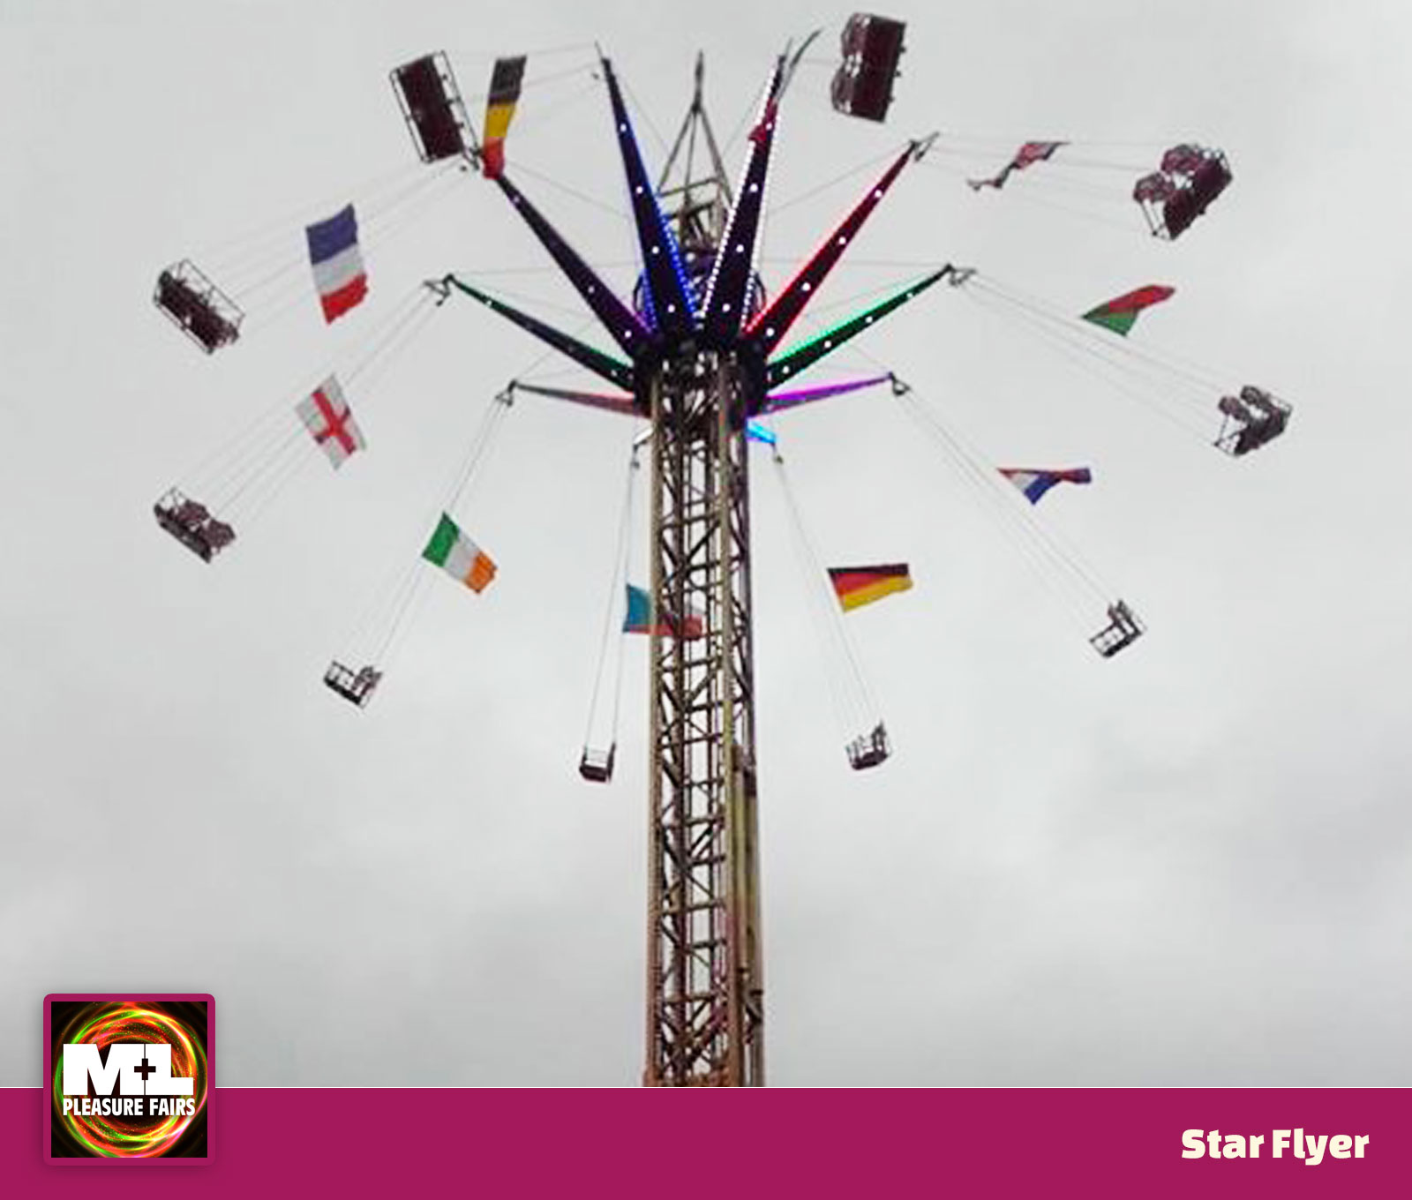 Superstar Ride Hire: M&L Pleasure Fairs